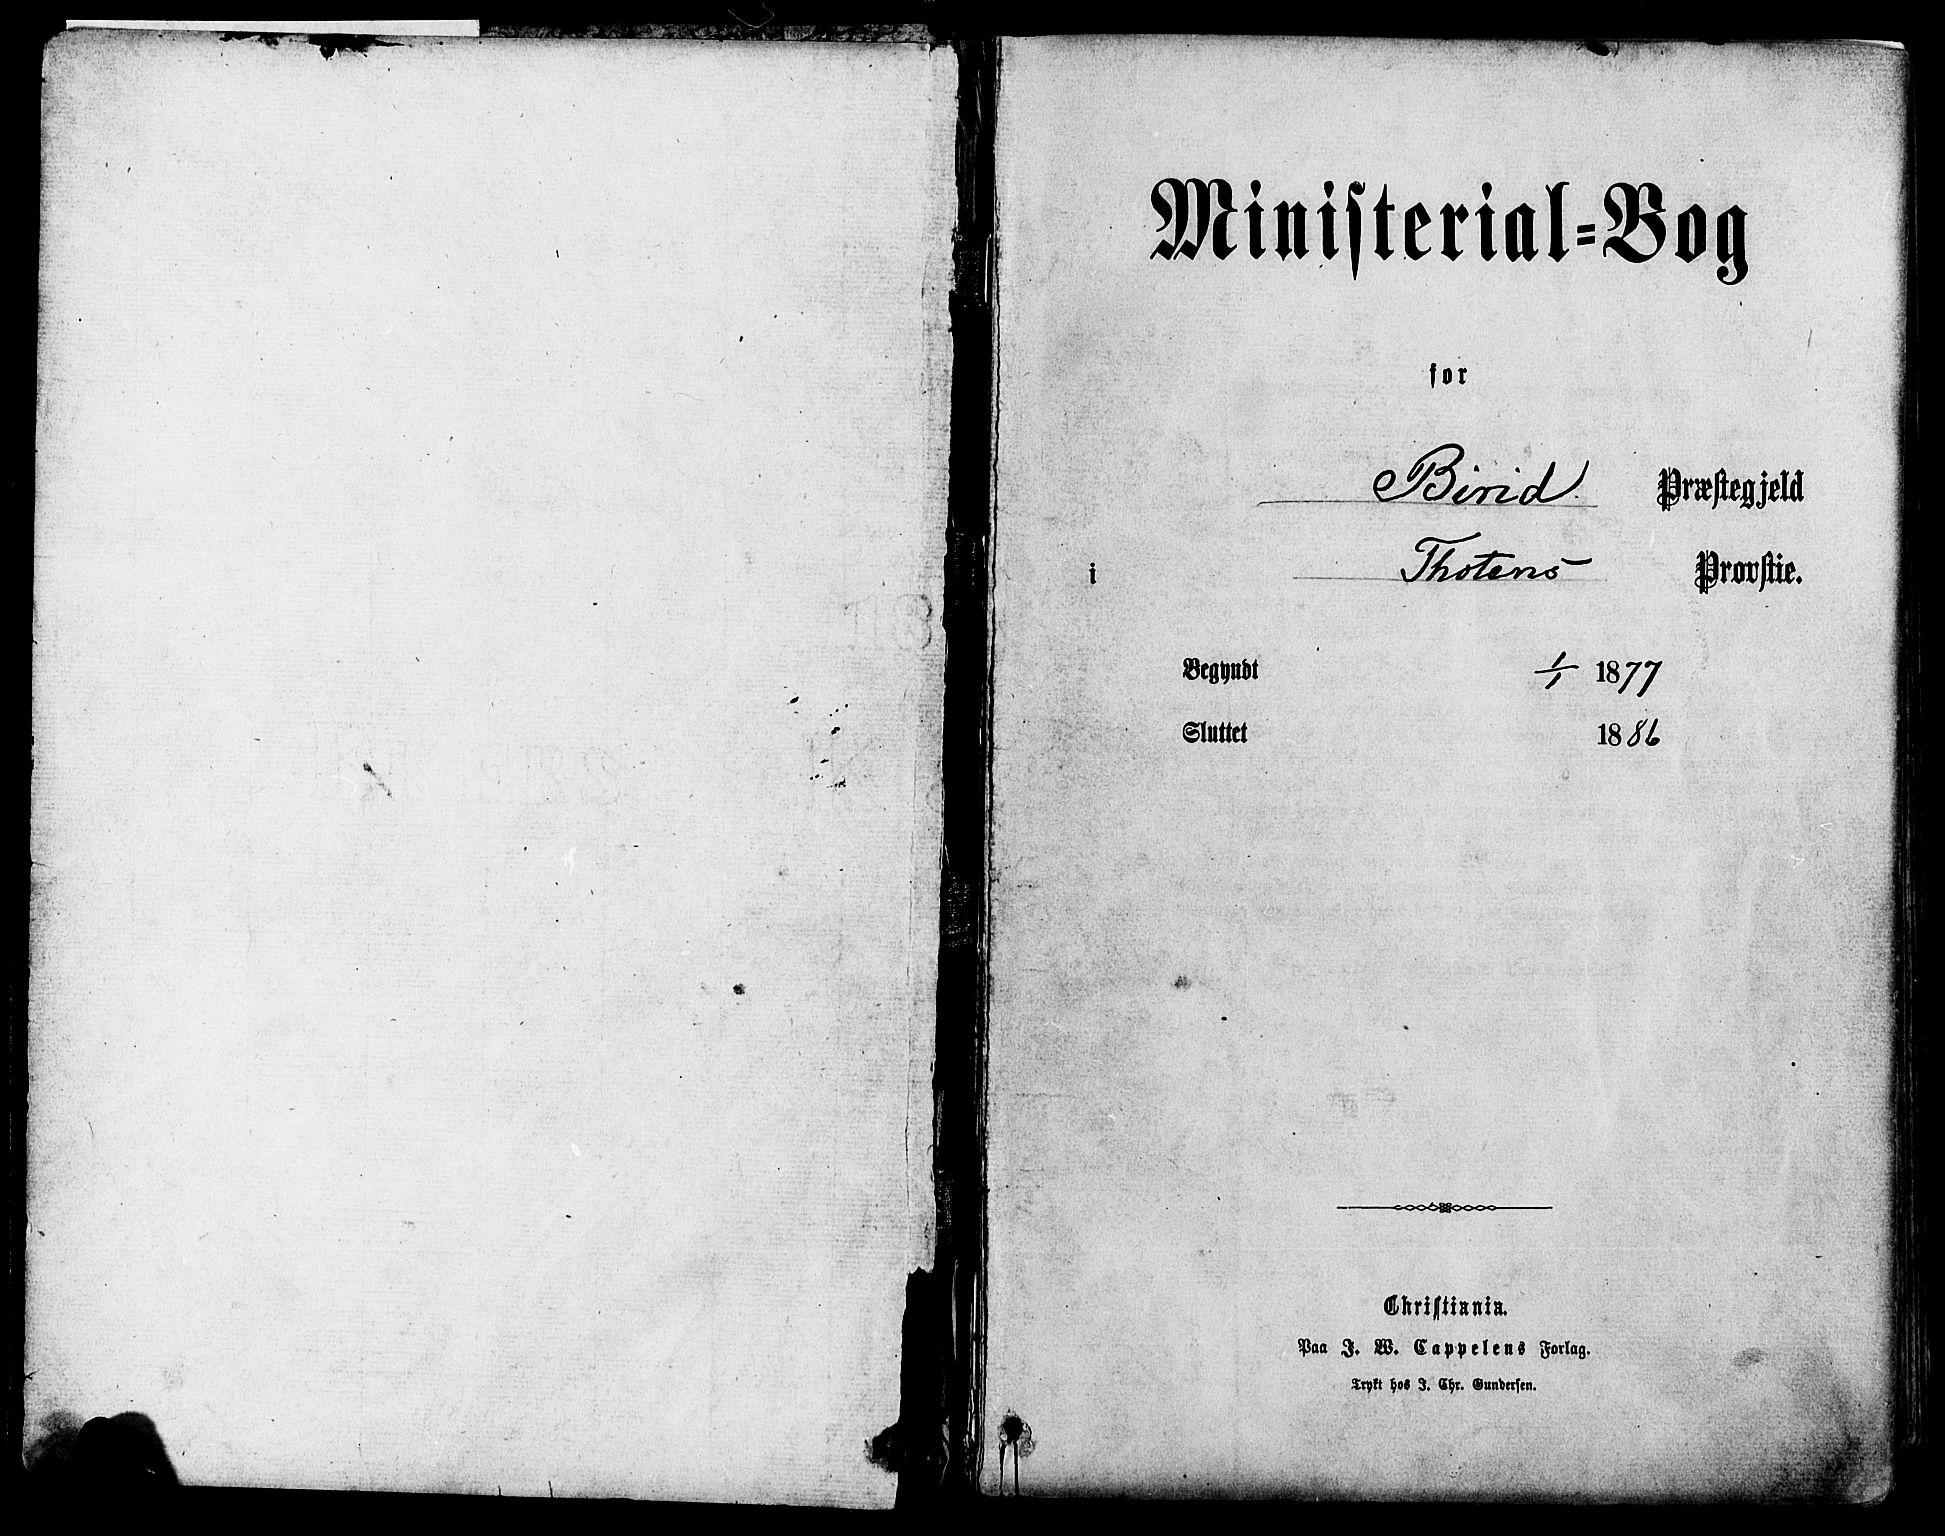 SAH, Biri prestekontor, Ministerialbok nr. 6, 1877-1886